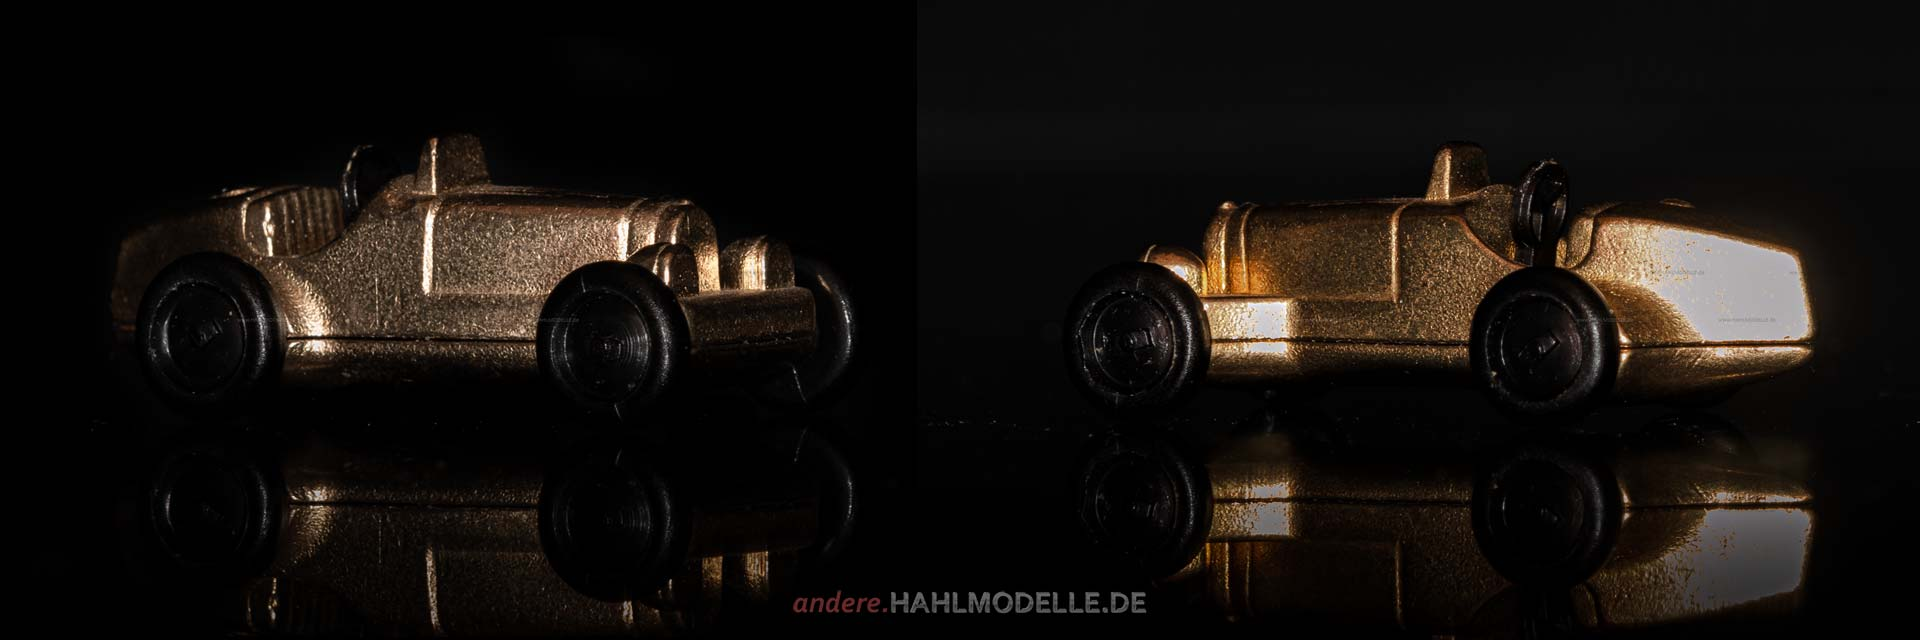 "Bugatti Typ 35 ""Grand Prix"" | Rennwagen | 1:120 | www.andere.hahlmodelle.de"